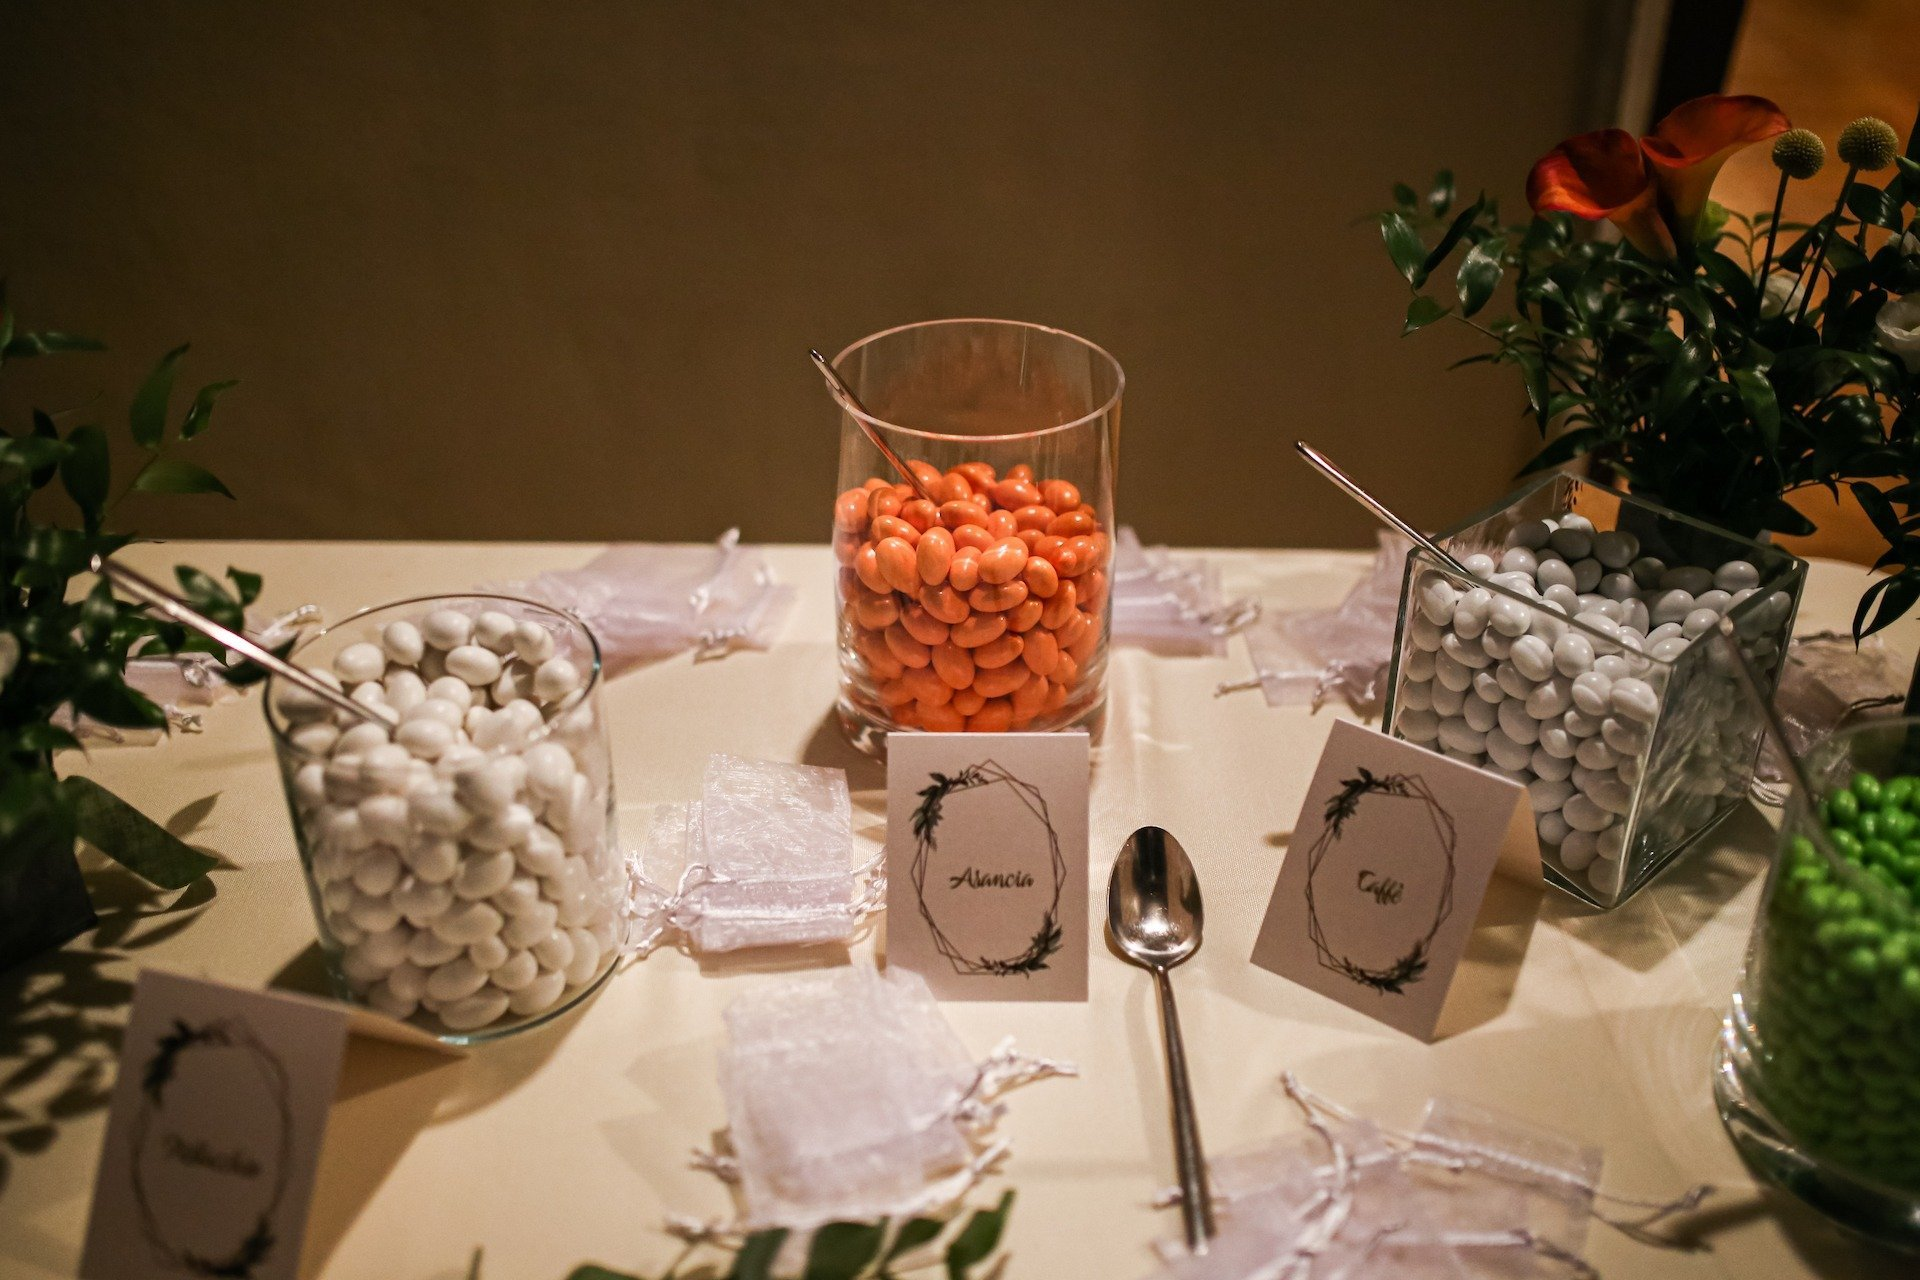 Matrimonio di MonicaMatrimonioBianco e Verde | Antonella Amato Wedding Planner_44